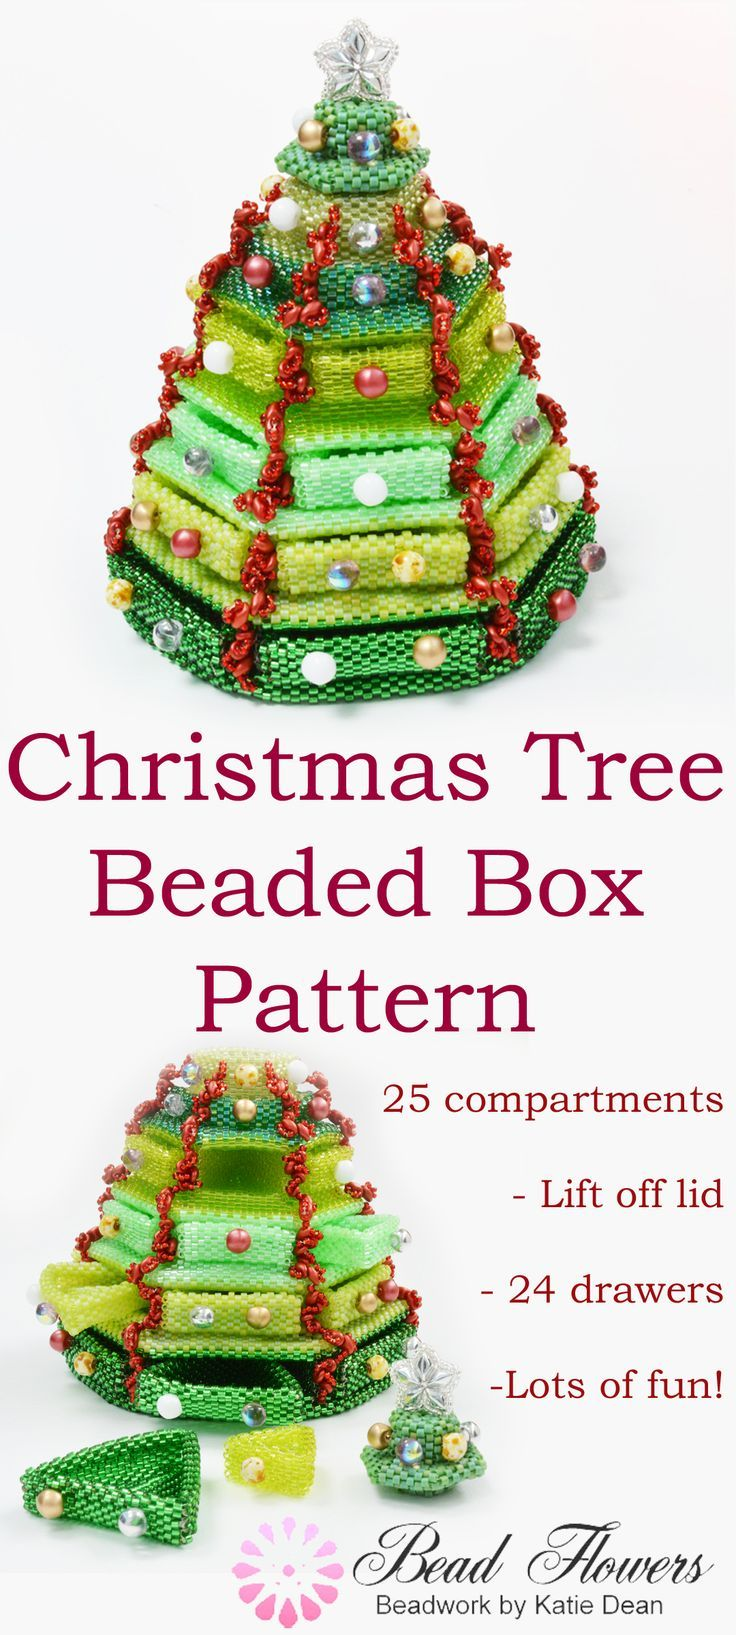 Christmas Tree Beaded Box Pattern Beaded boxes